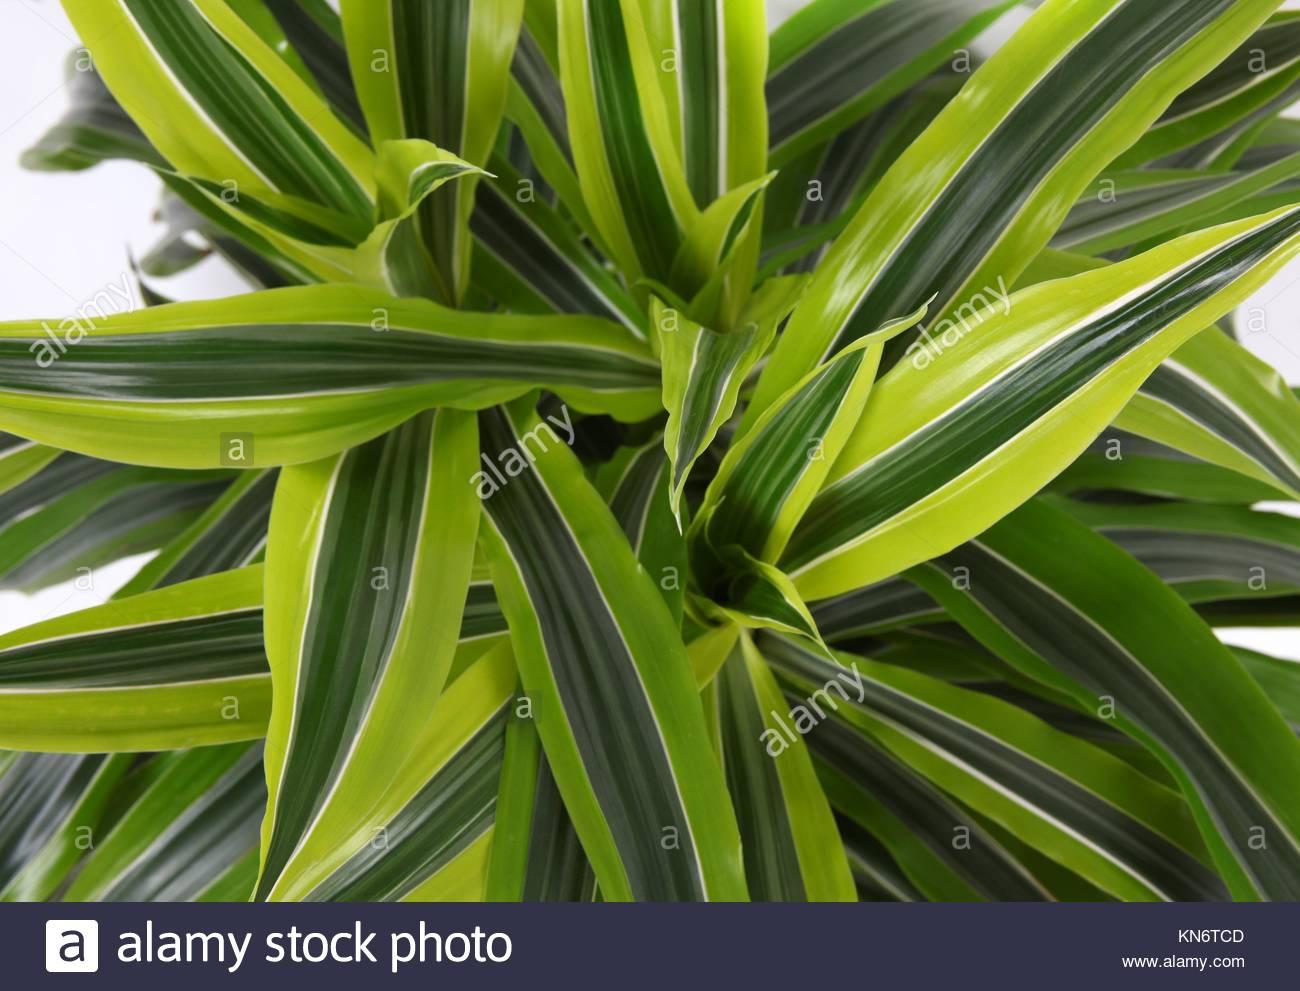 Chlorophytum - immergrüne mehrjährige blühende Pflanzen in der Familie Asparagaceae. Stockbild